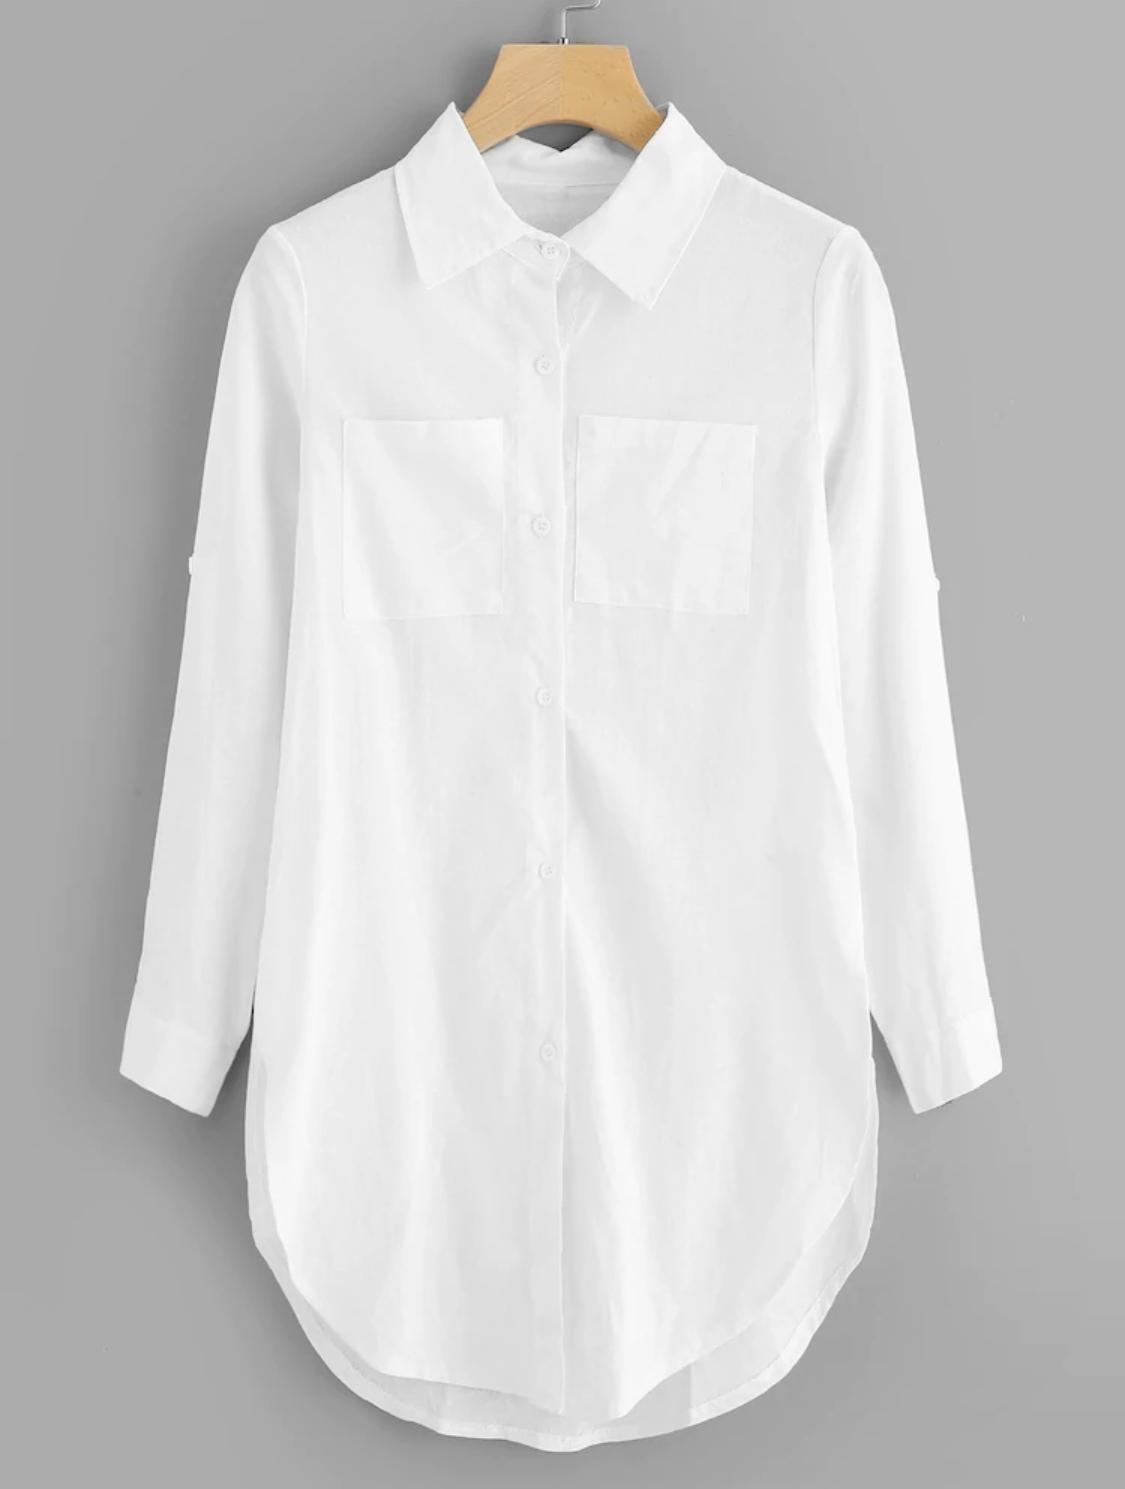 SHEIN Patch Pocket Curved Hem Longline Shirt